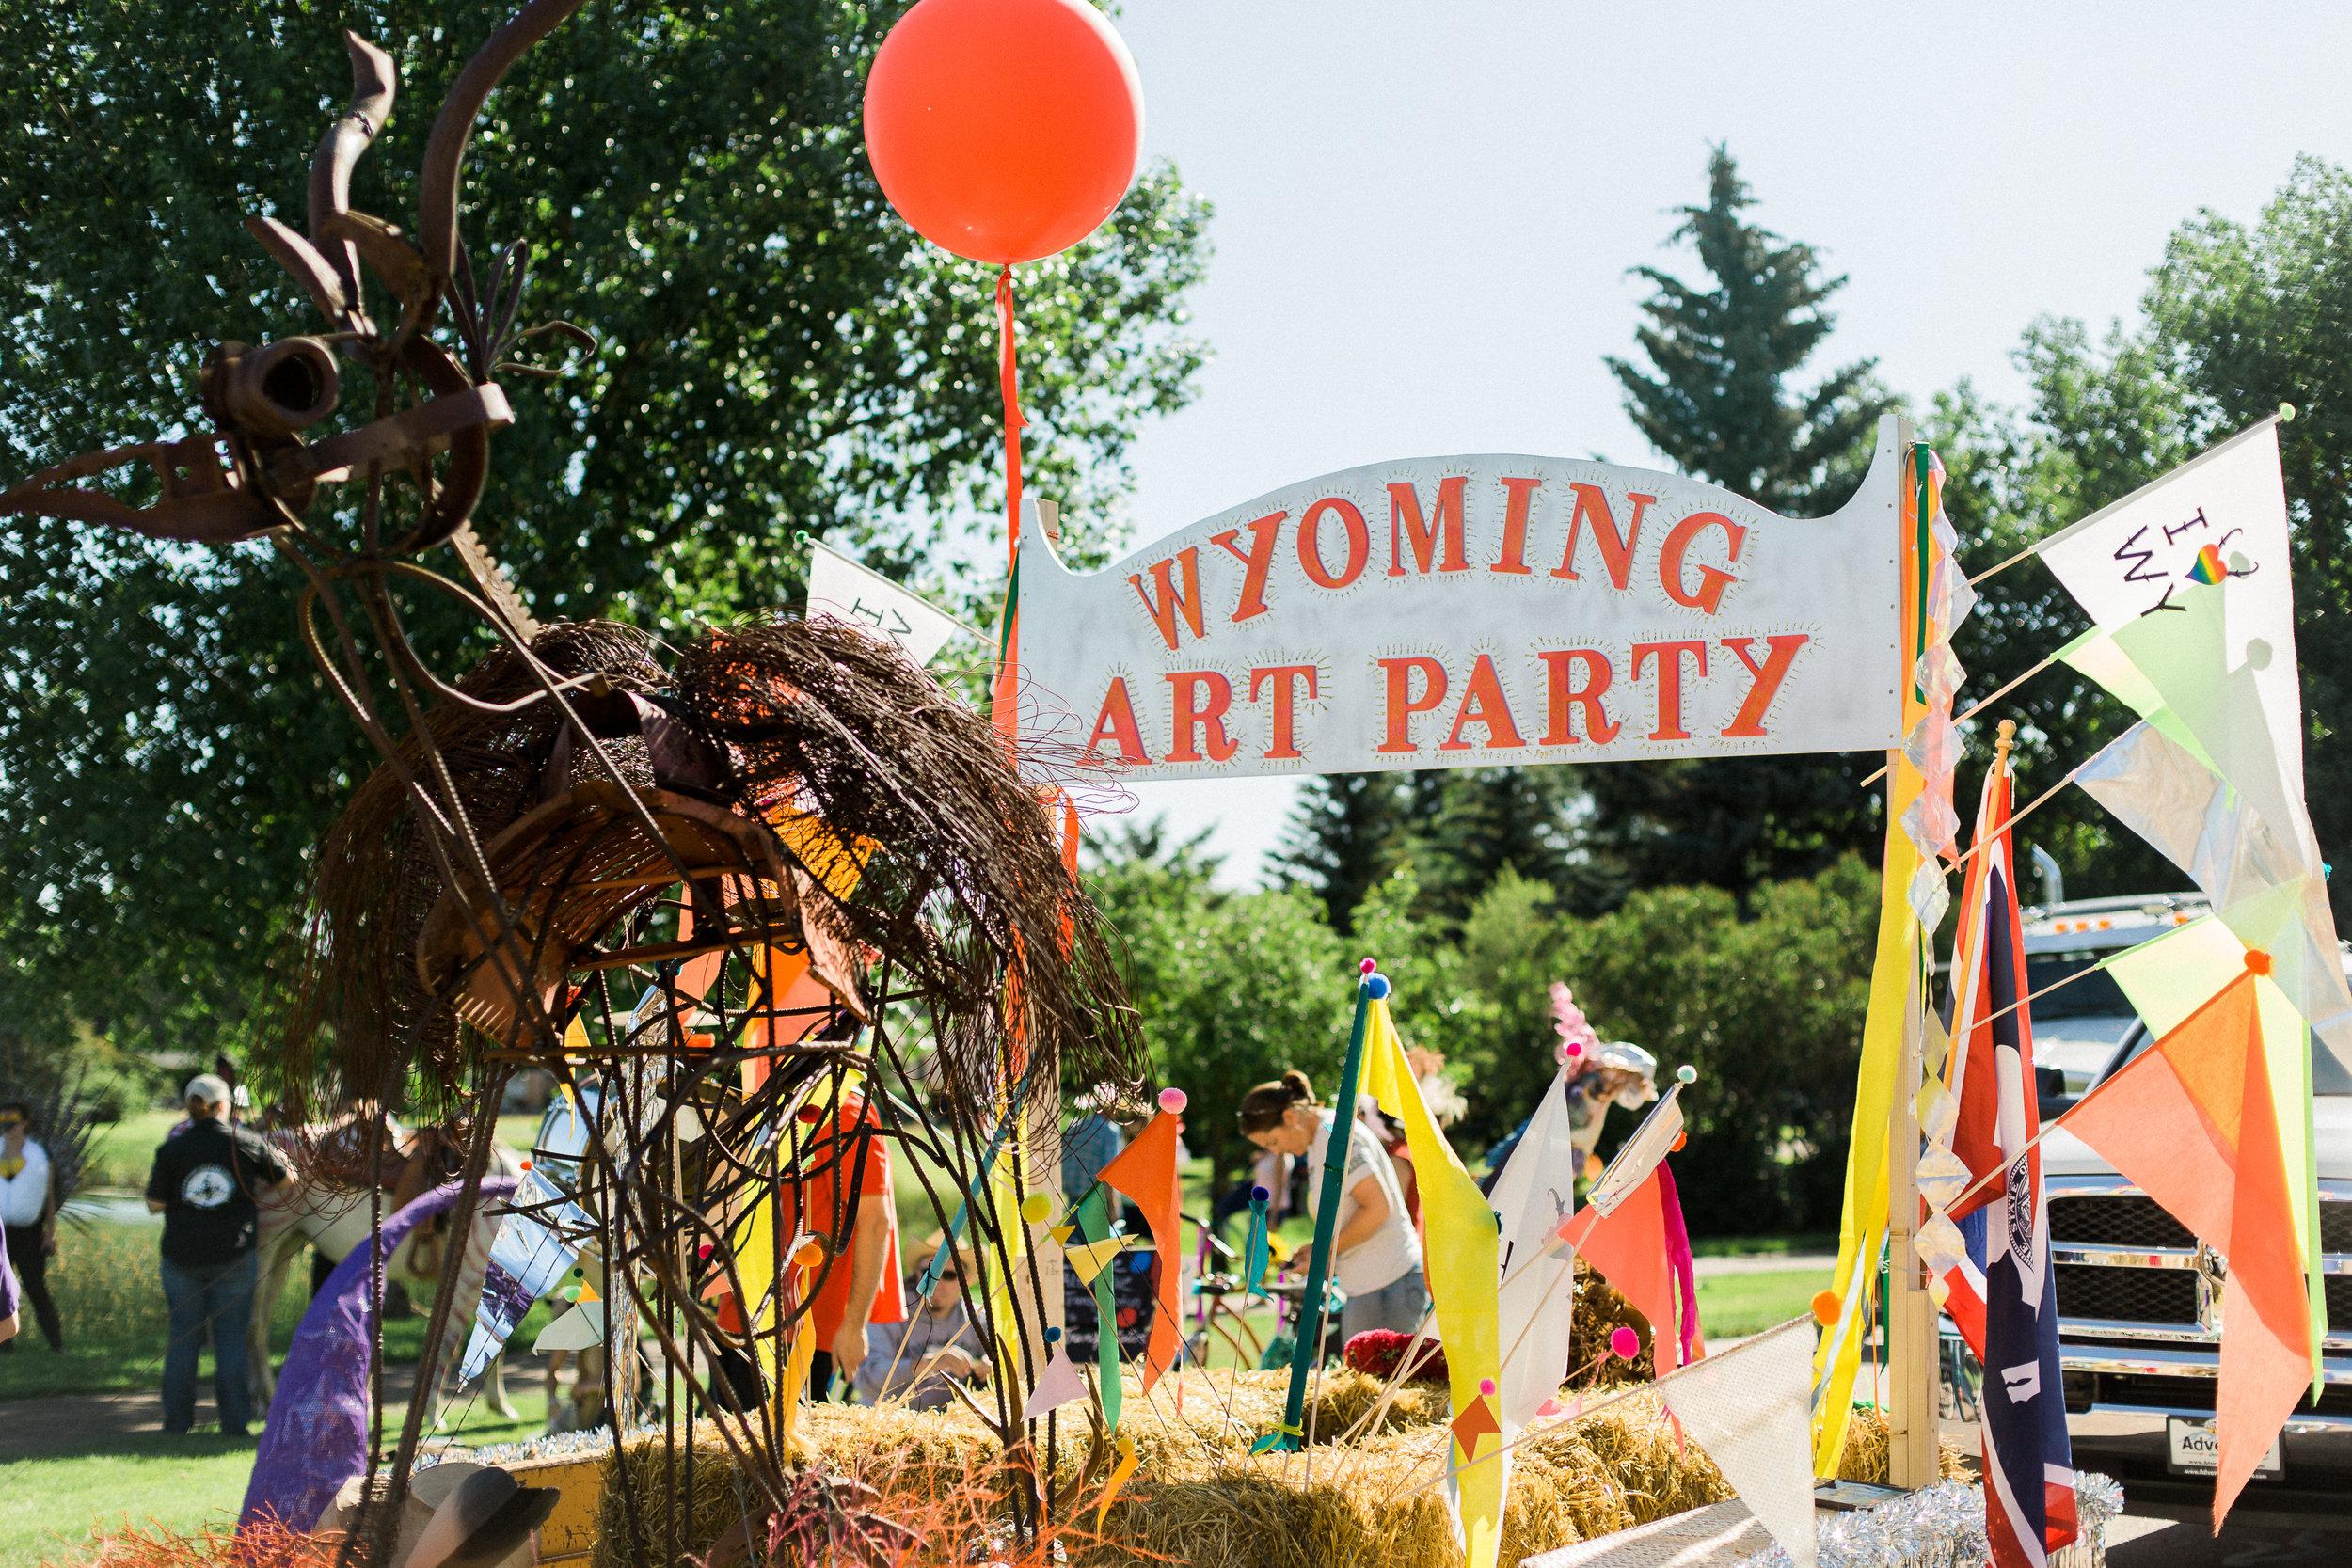 Wyoming Art Party - Parade 2016-7.jpg